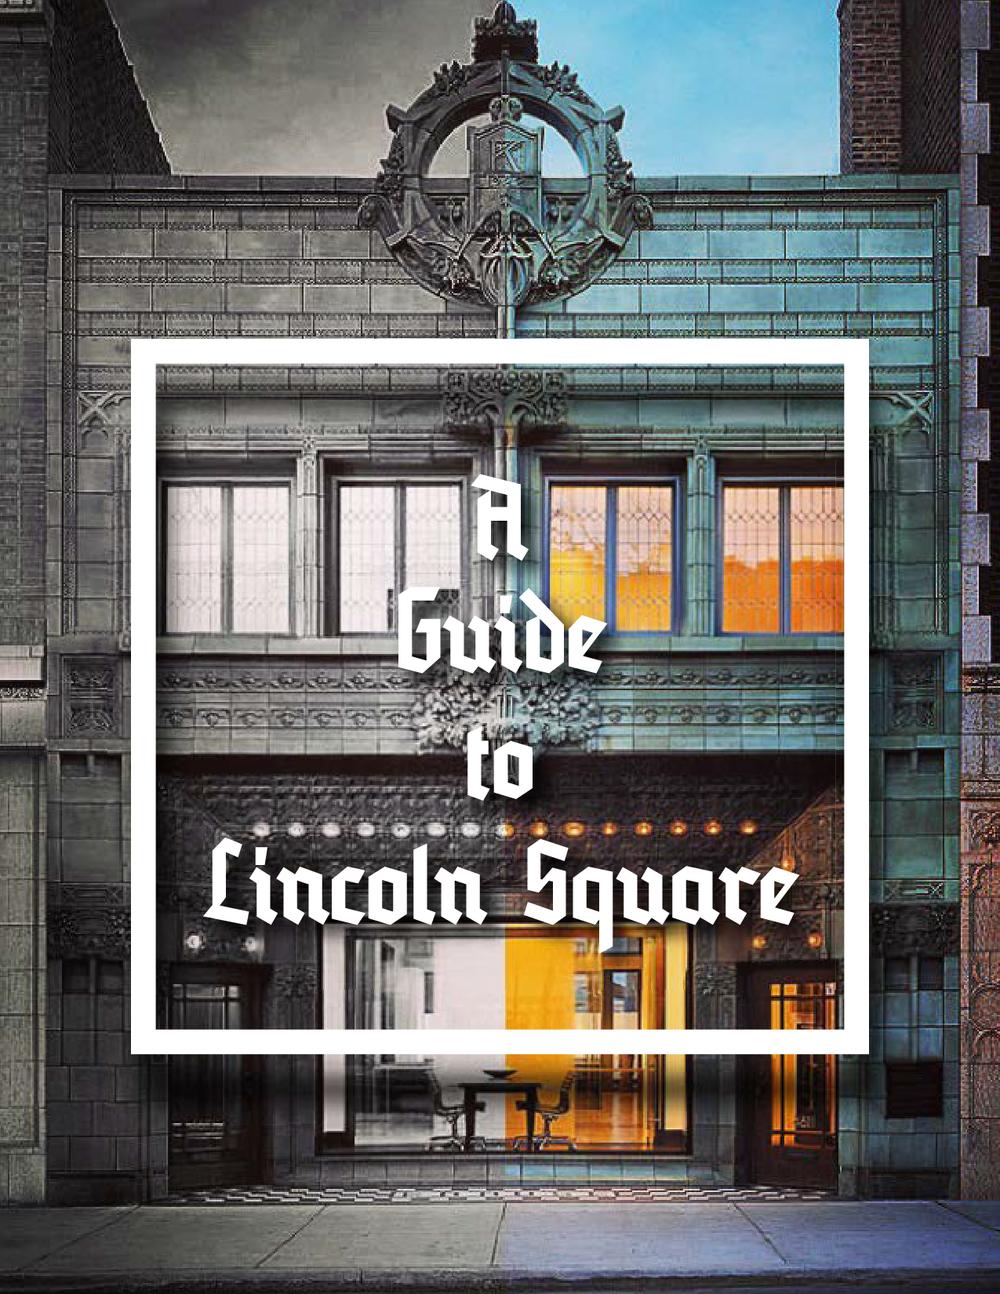 Lincoln_Sq_Community_Magazine-01.png